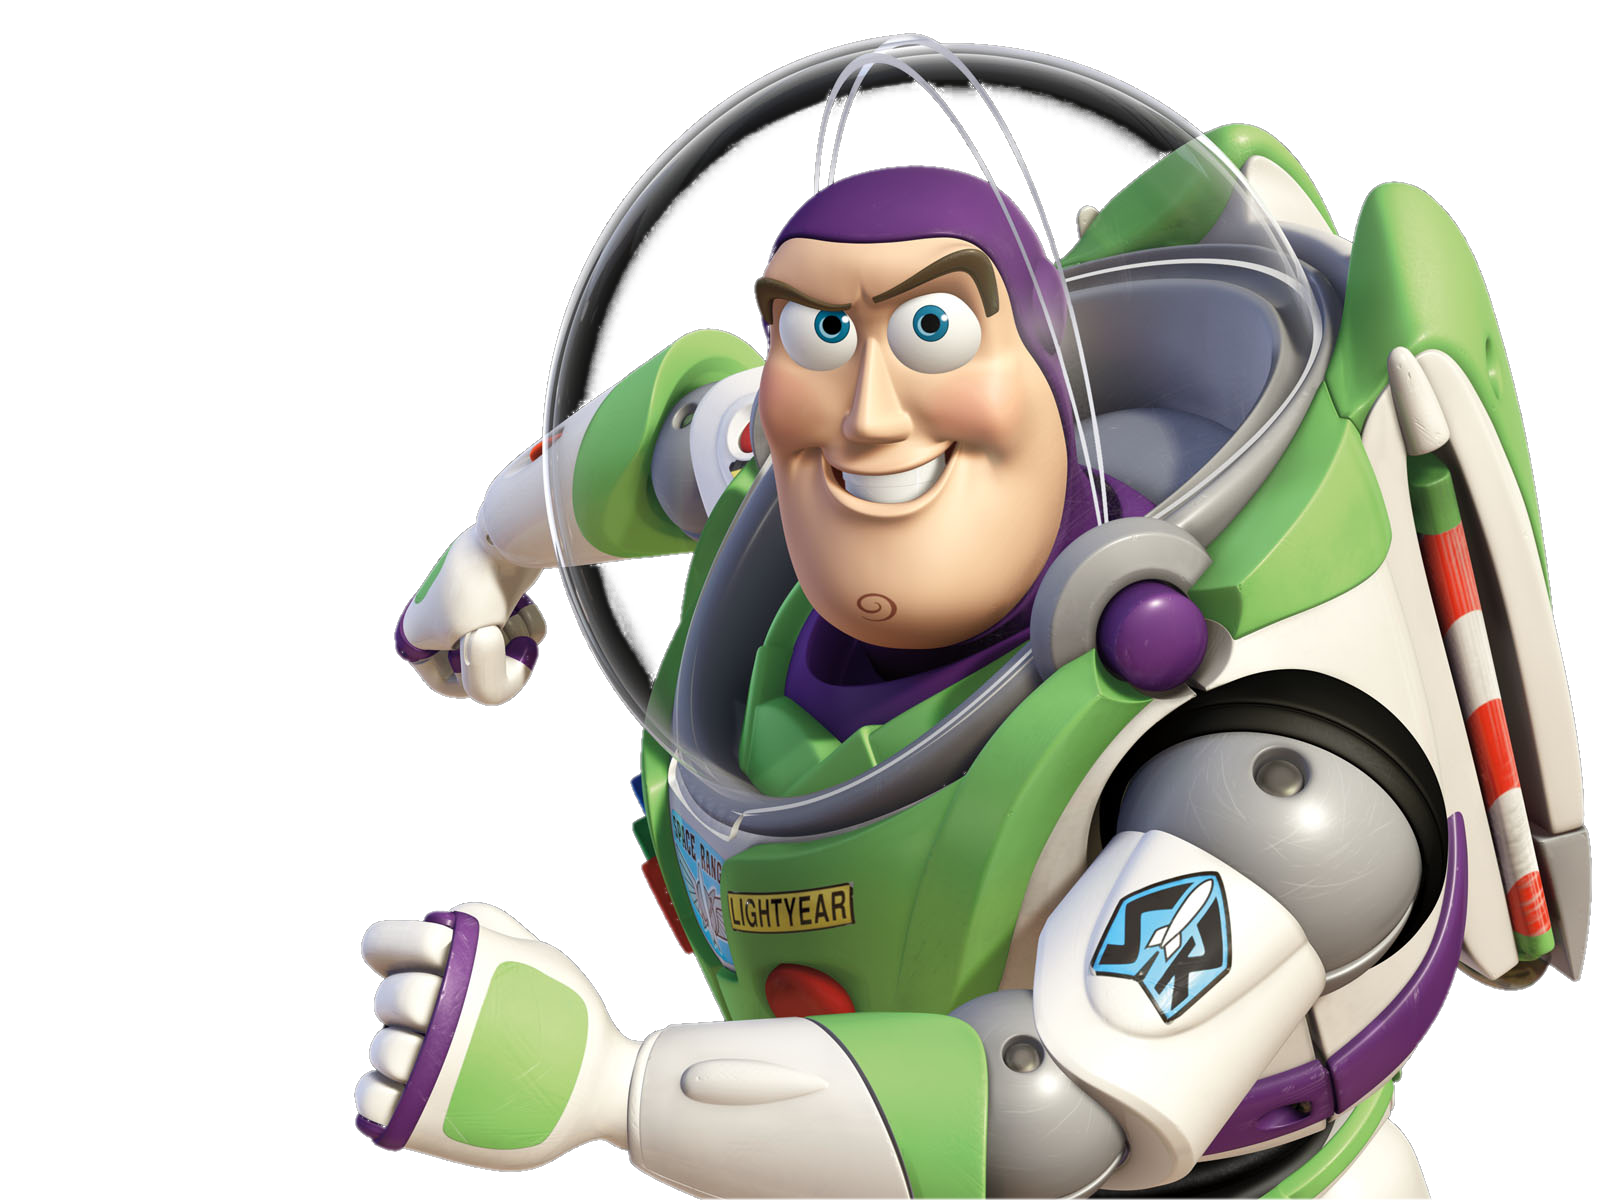 Toystoryparaimprimir1 Png 1600 1200 Imagenes De Buzz Lightyear Cumpleanos De Toy Story Toy Story